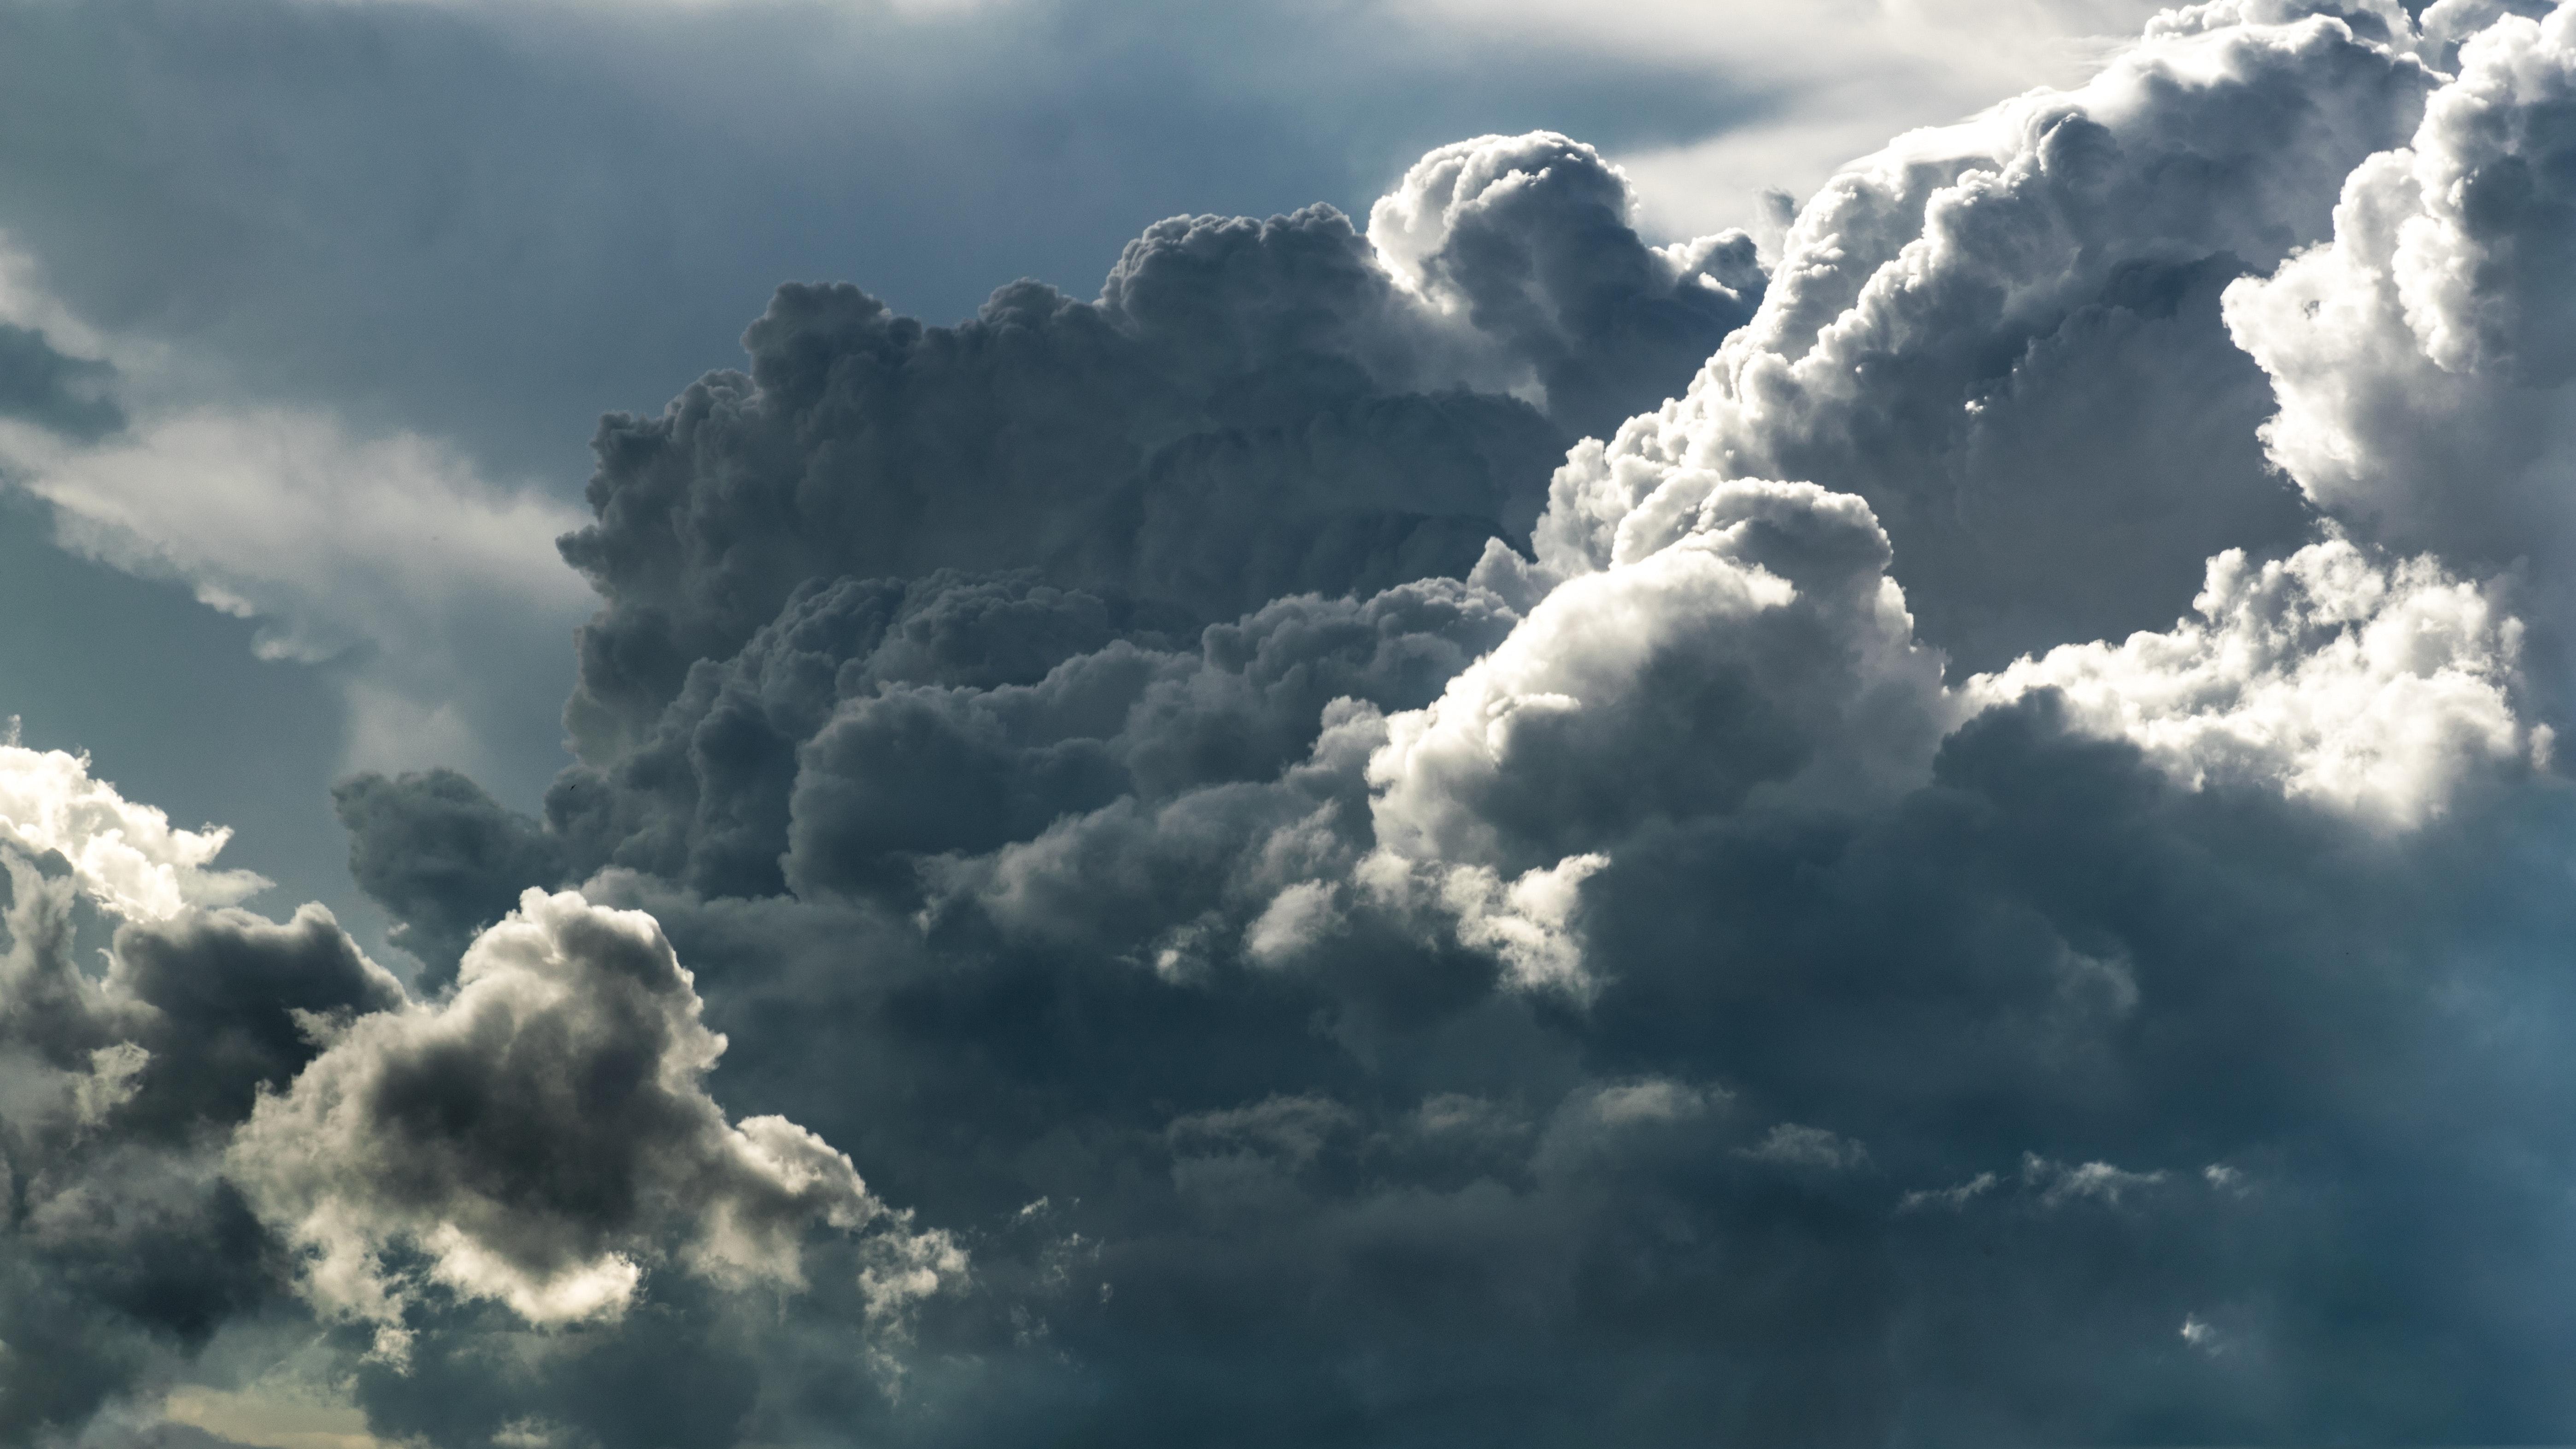 1000 Wolken Fotos  Pexels  Kostenlose Stock Fotos-3665